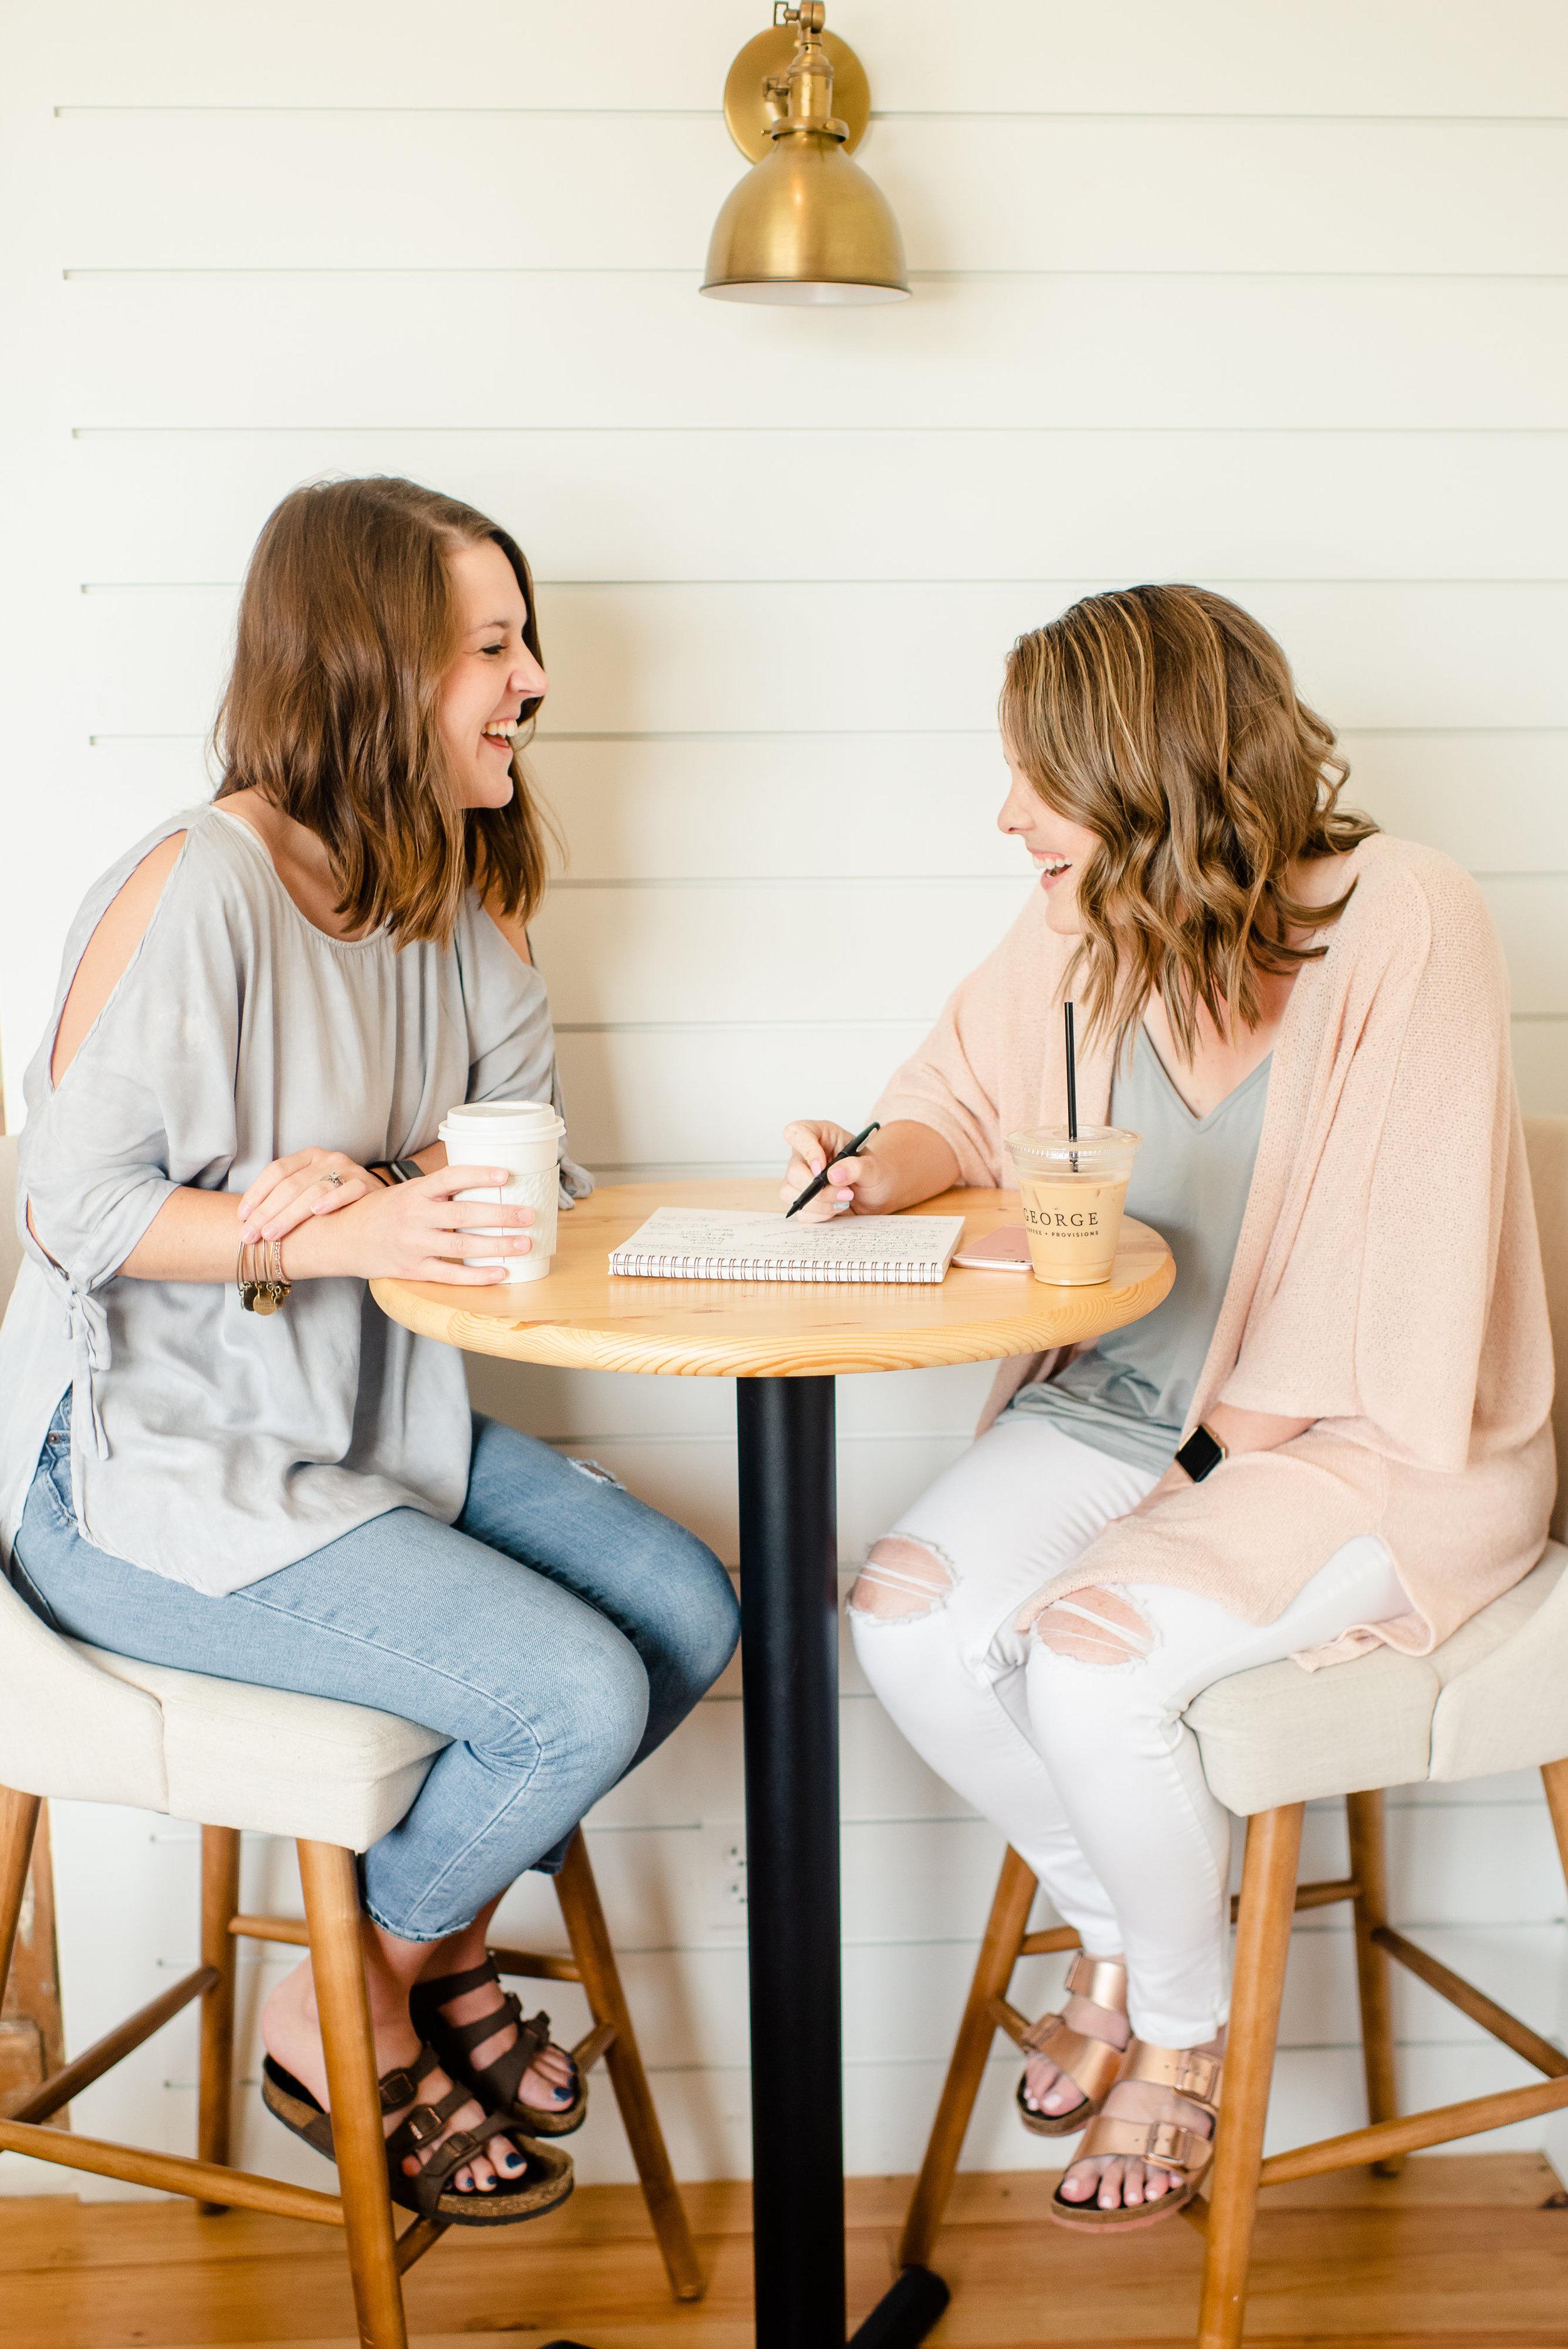 jess-xo-copy-for-creatives-the-copywriter-who-gets-you-copy-for-small-business-entrepreneurs15.jpg